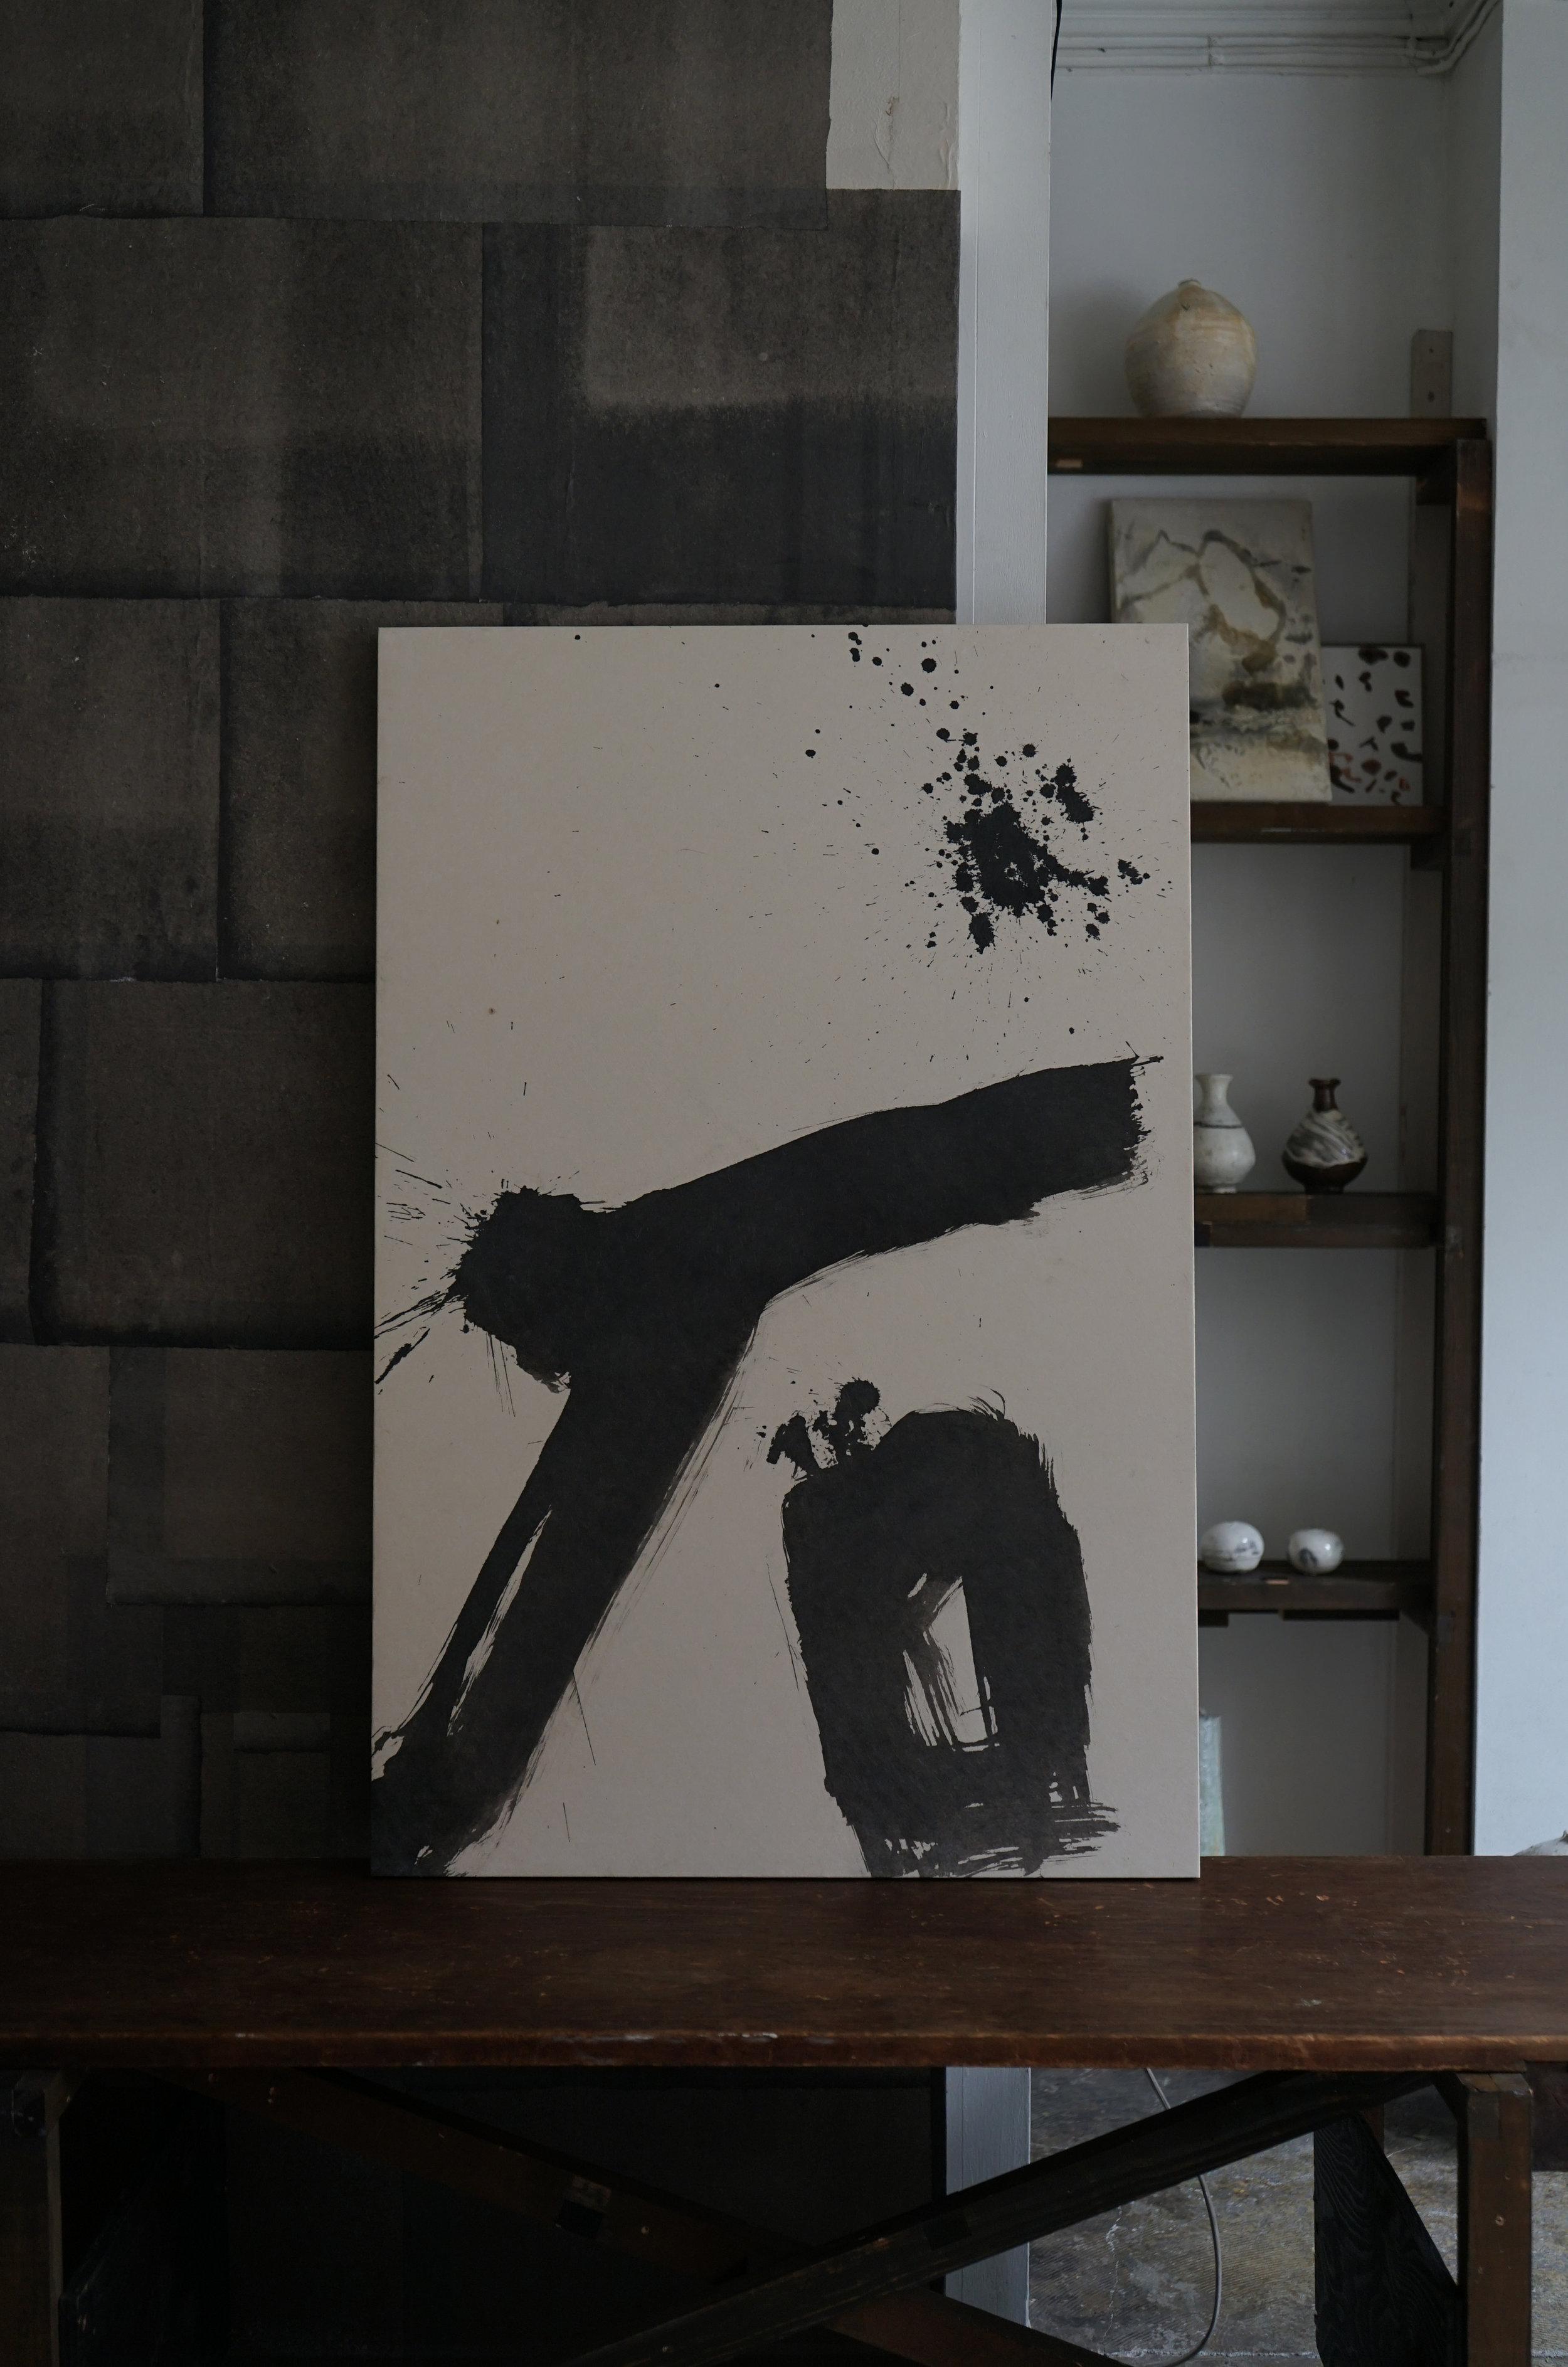 辻村史朗「石」| Stone by Shiro Tsujimura